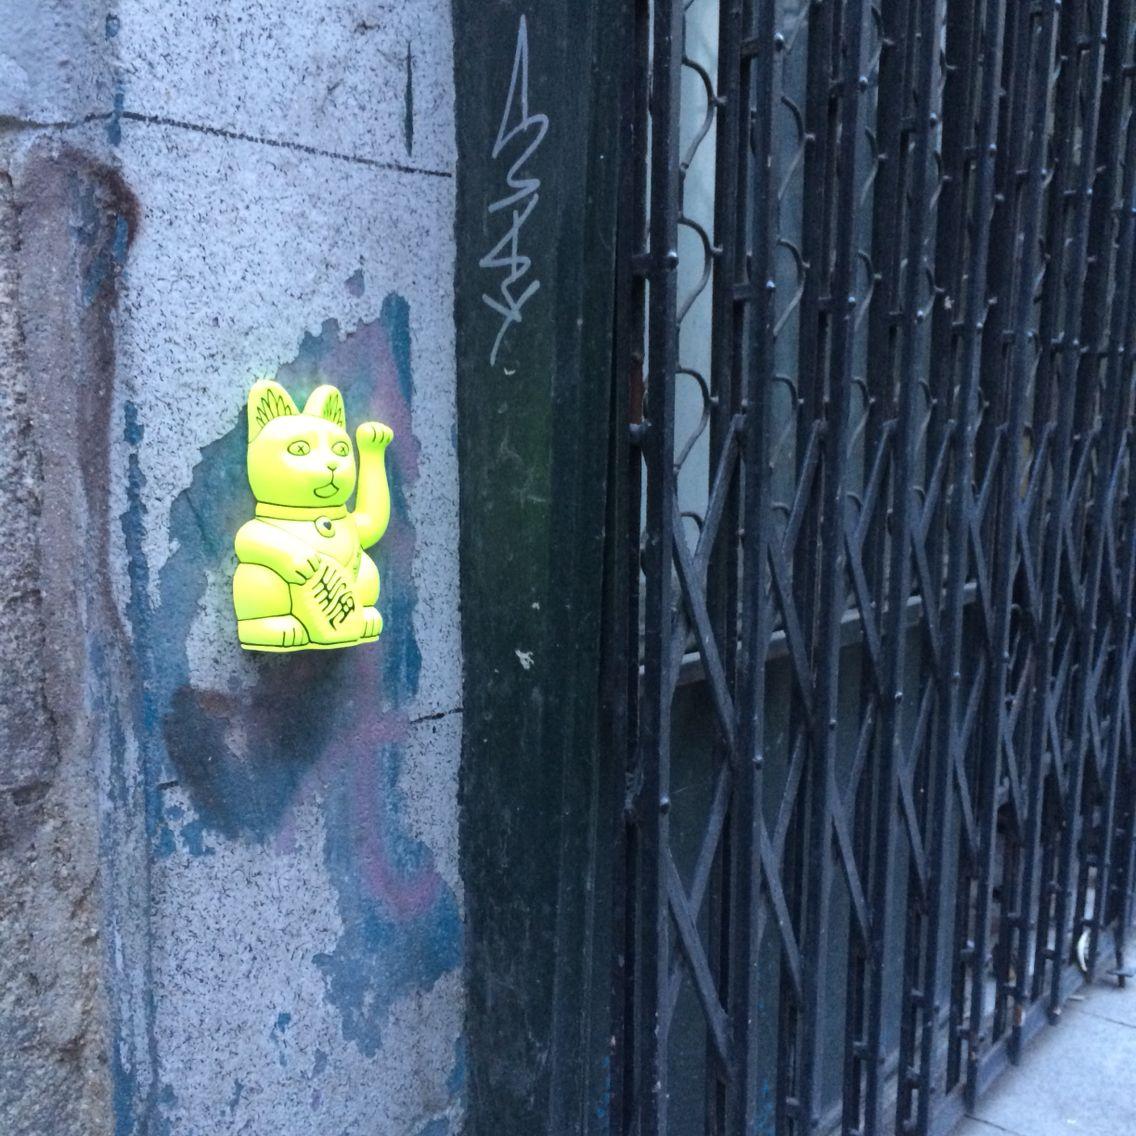 #Madrid - #Spain . srmiau.com  #art #arttoy #popart #arte #artepop #street #streetart #arteurbano #streetnews #streetartanarchy #figure #puertadelsol #wall #urbanart #neko #maneki #luckycat #manekineko #cats #gatos #españa #elcarmen #sculpture #design #diseño #cool #photo #pic #originalart #original #fluor #flúor #figure #cat #cats #gato #gatodelasuerte #gatos #fortunecat #cool #chic #top #beautiful #color #colorful #yellow